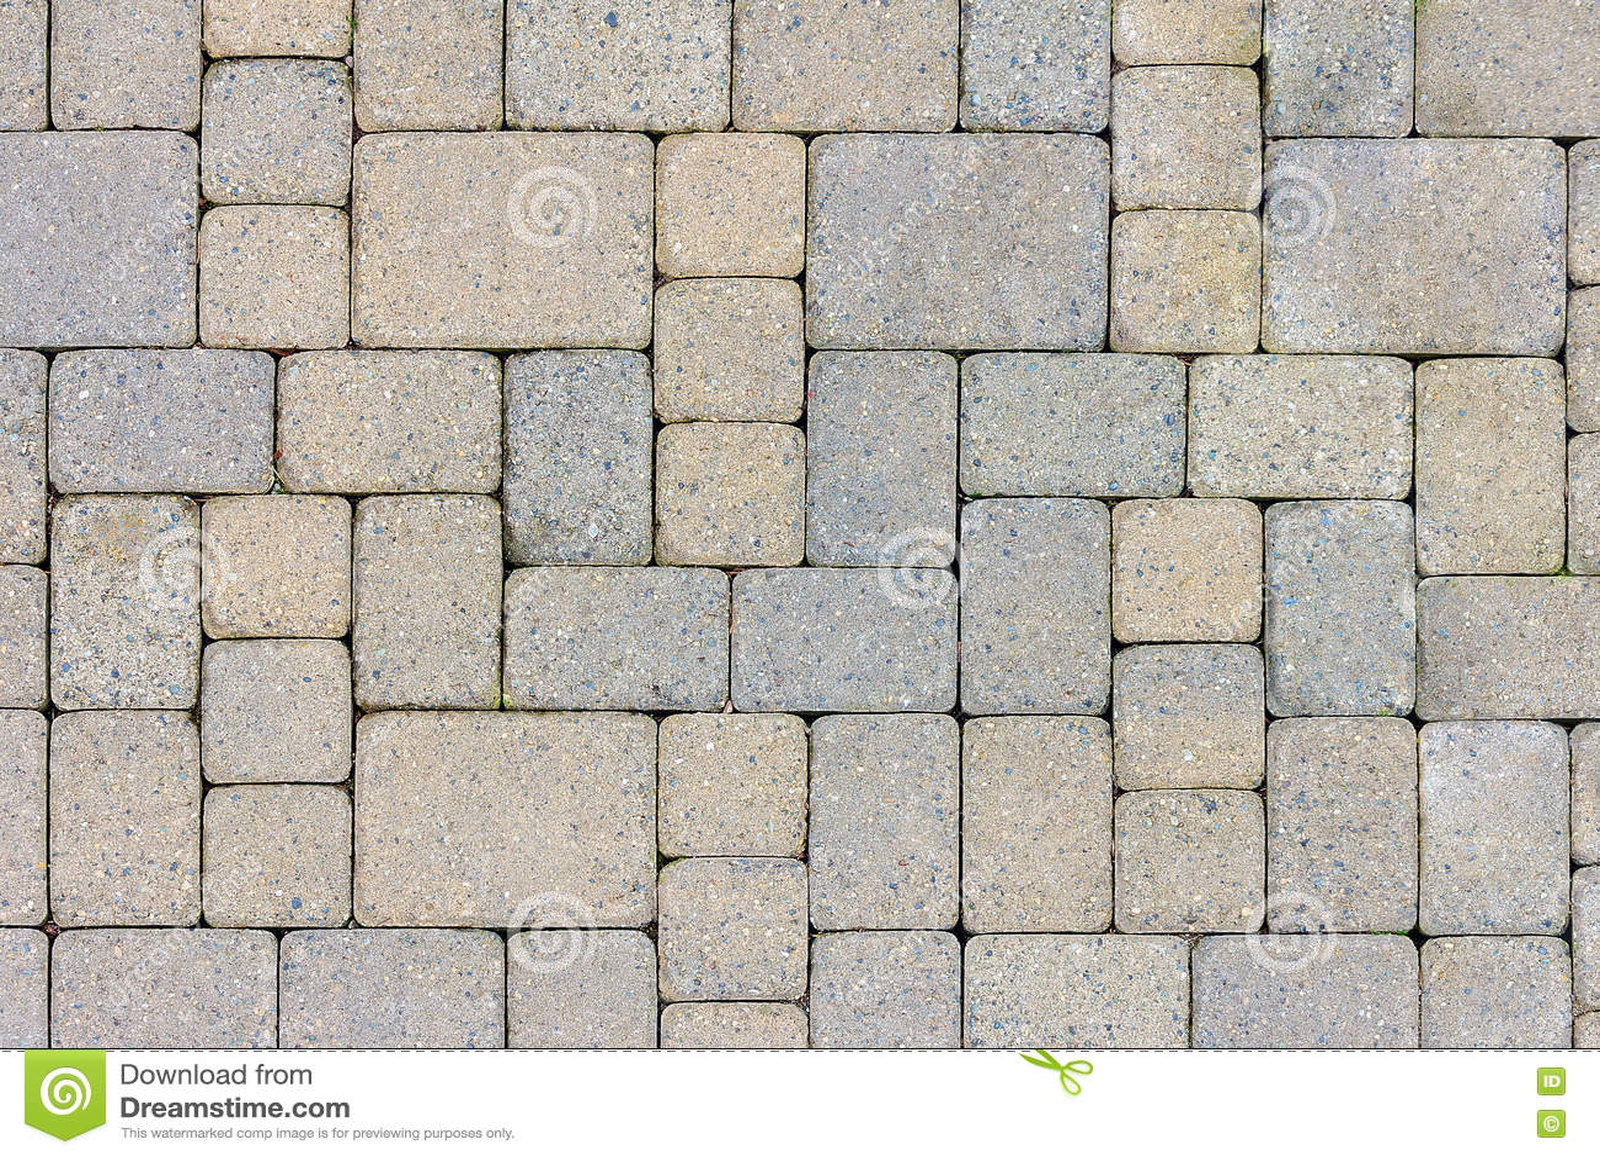 Garden Patio Stone Pavers Top View Stock Image   Image Of Stone, Texture:  74266641